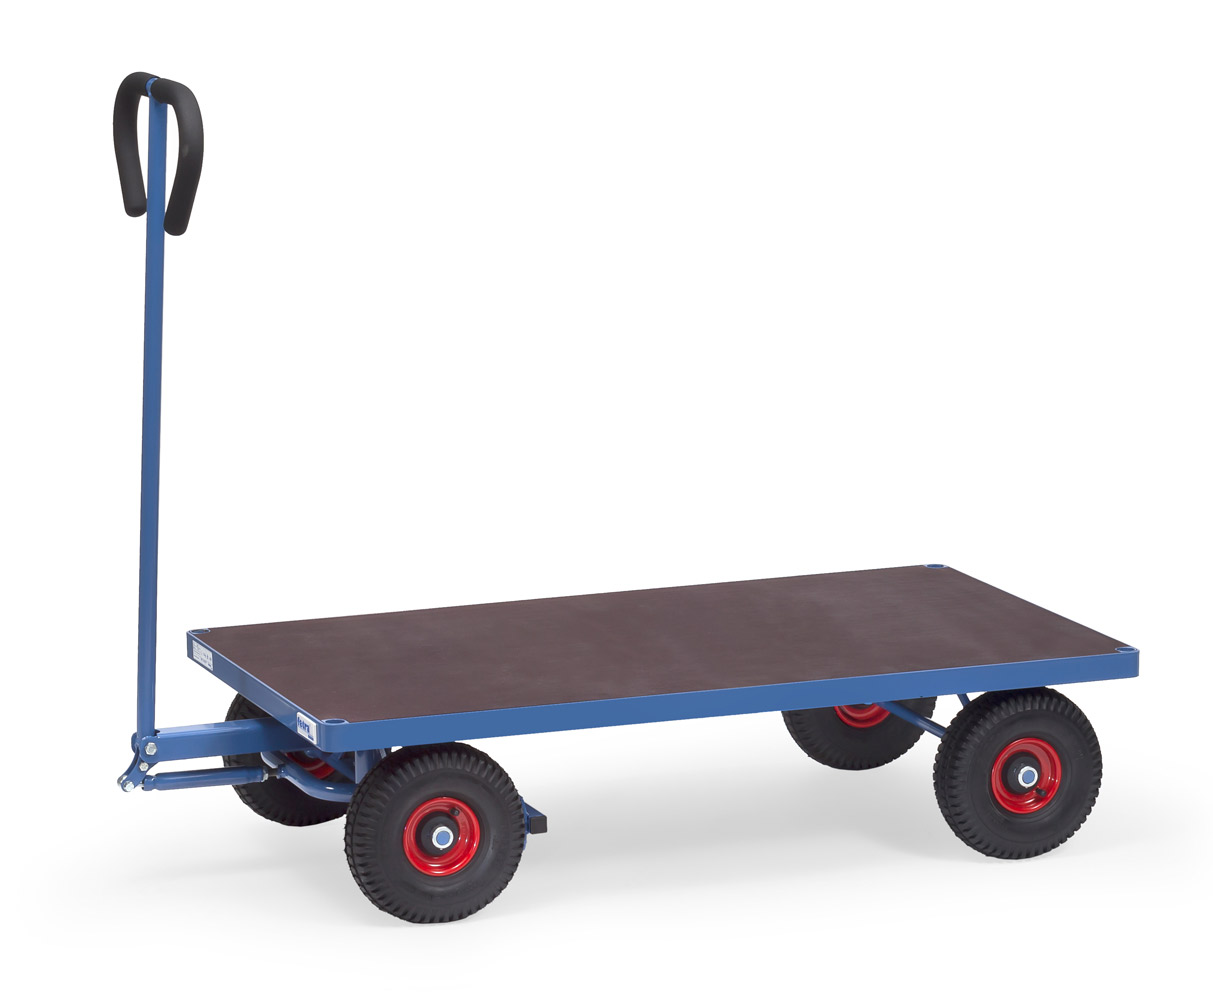 fetra 4001 4001v 4002 4002v handwagen mit plattform 500 kg handwagen transportwagen. Black Bedroom Furniture Sets. Home Design Ideas